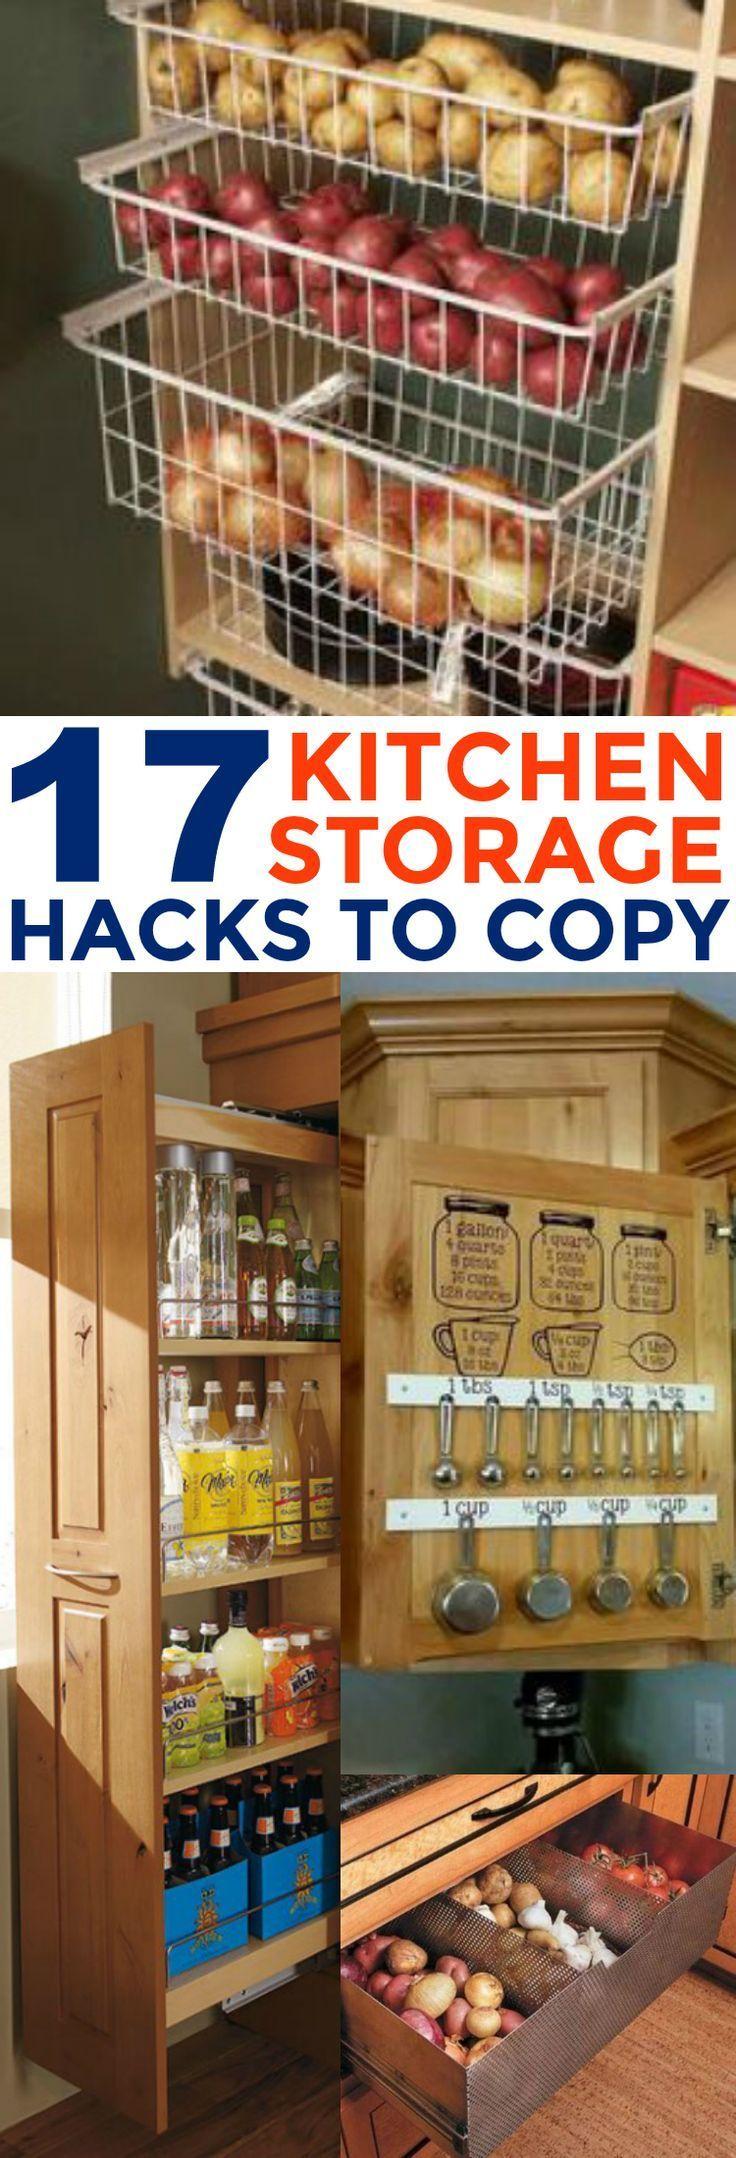 17 Organization and Storage Photos That Will